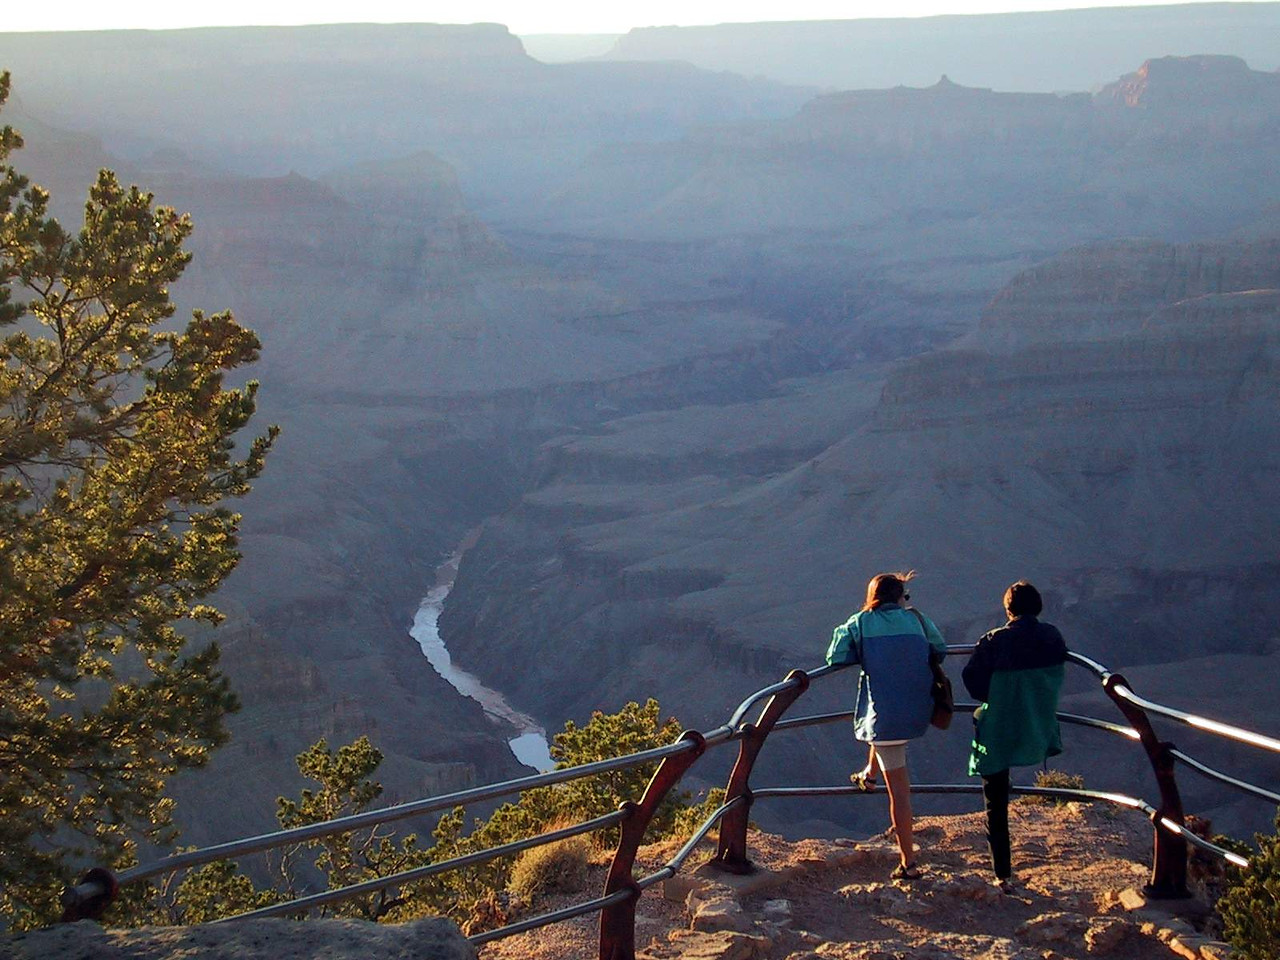 Grand Canyon South Rim, September 2000